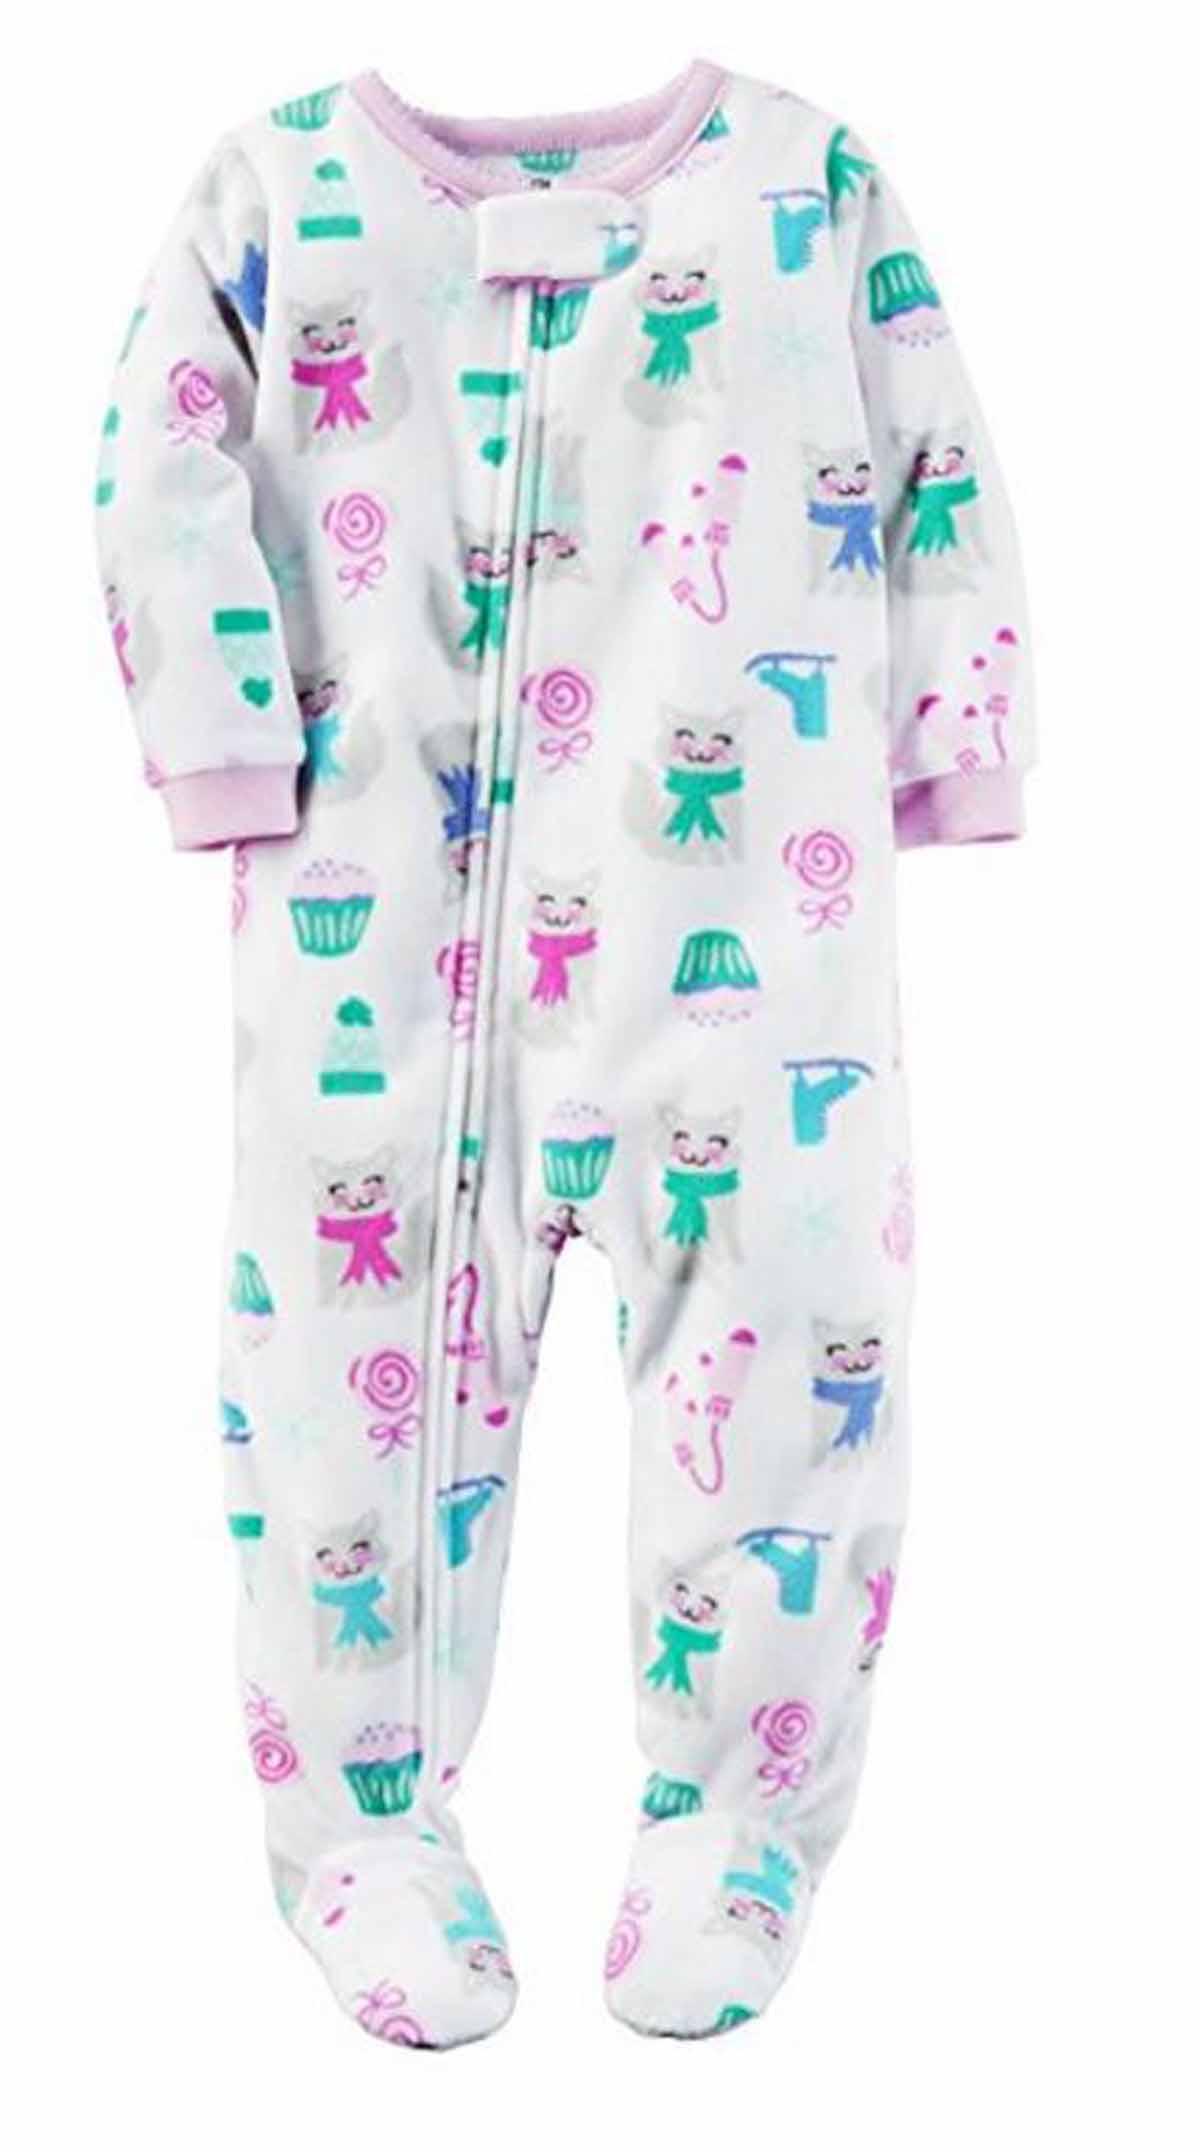 Fleece Girls Pajamas Breeze Clothing